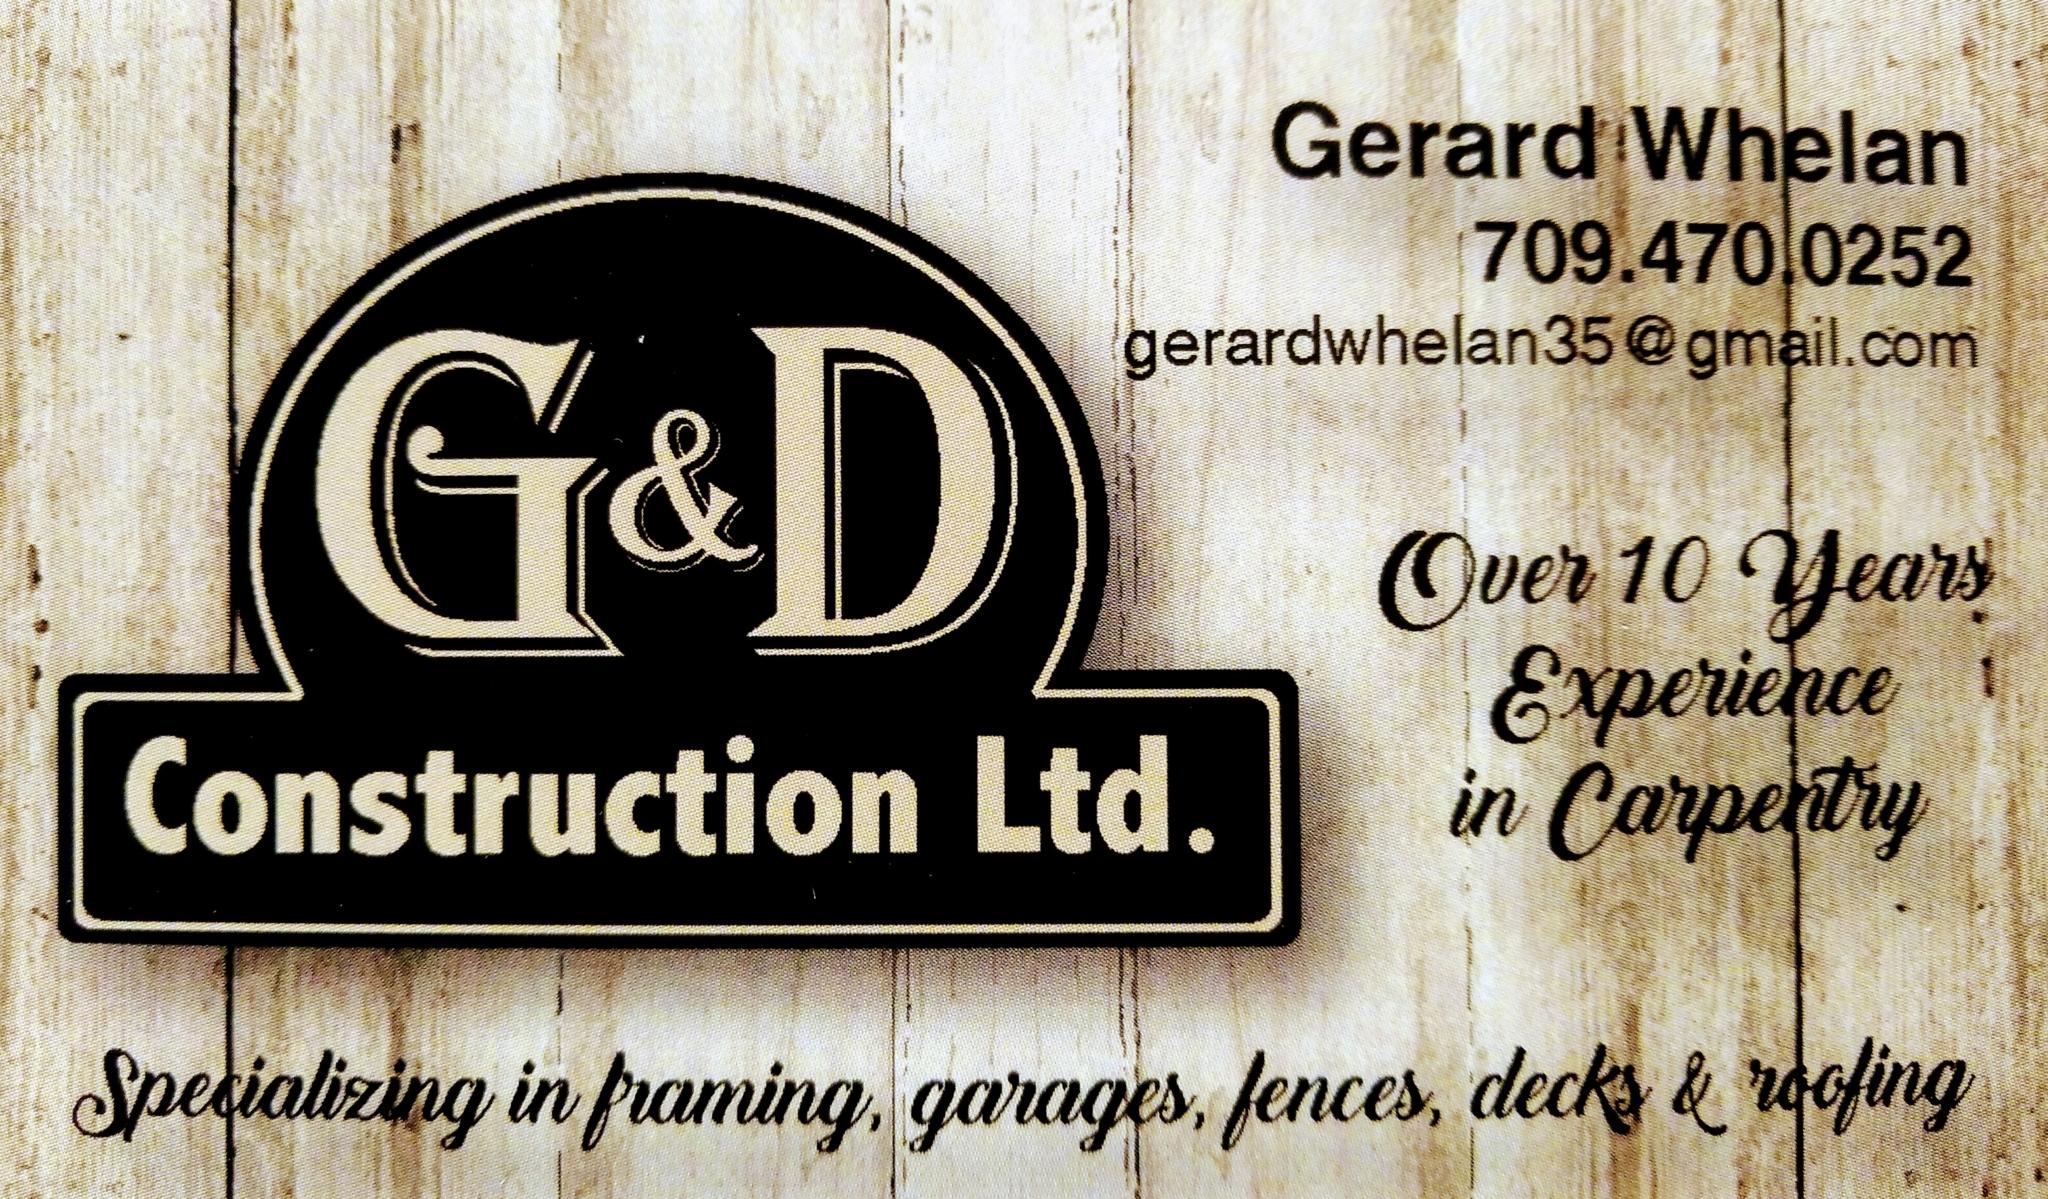 G&D Construction